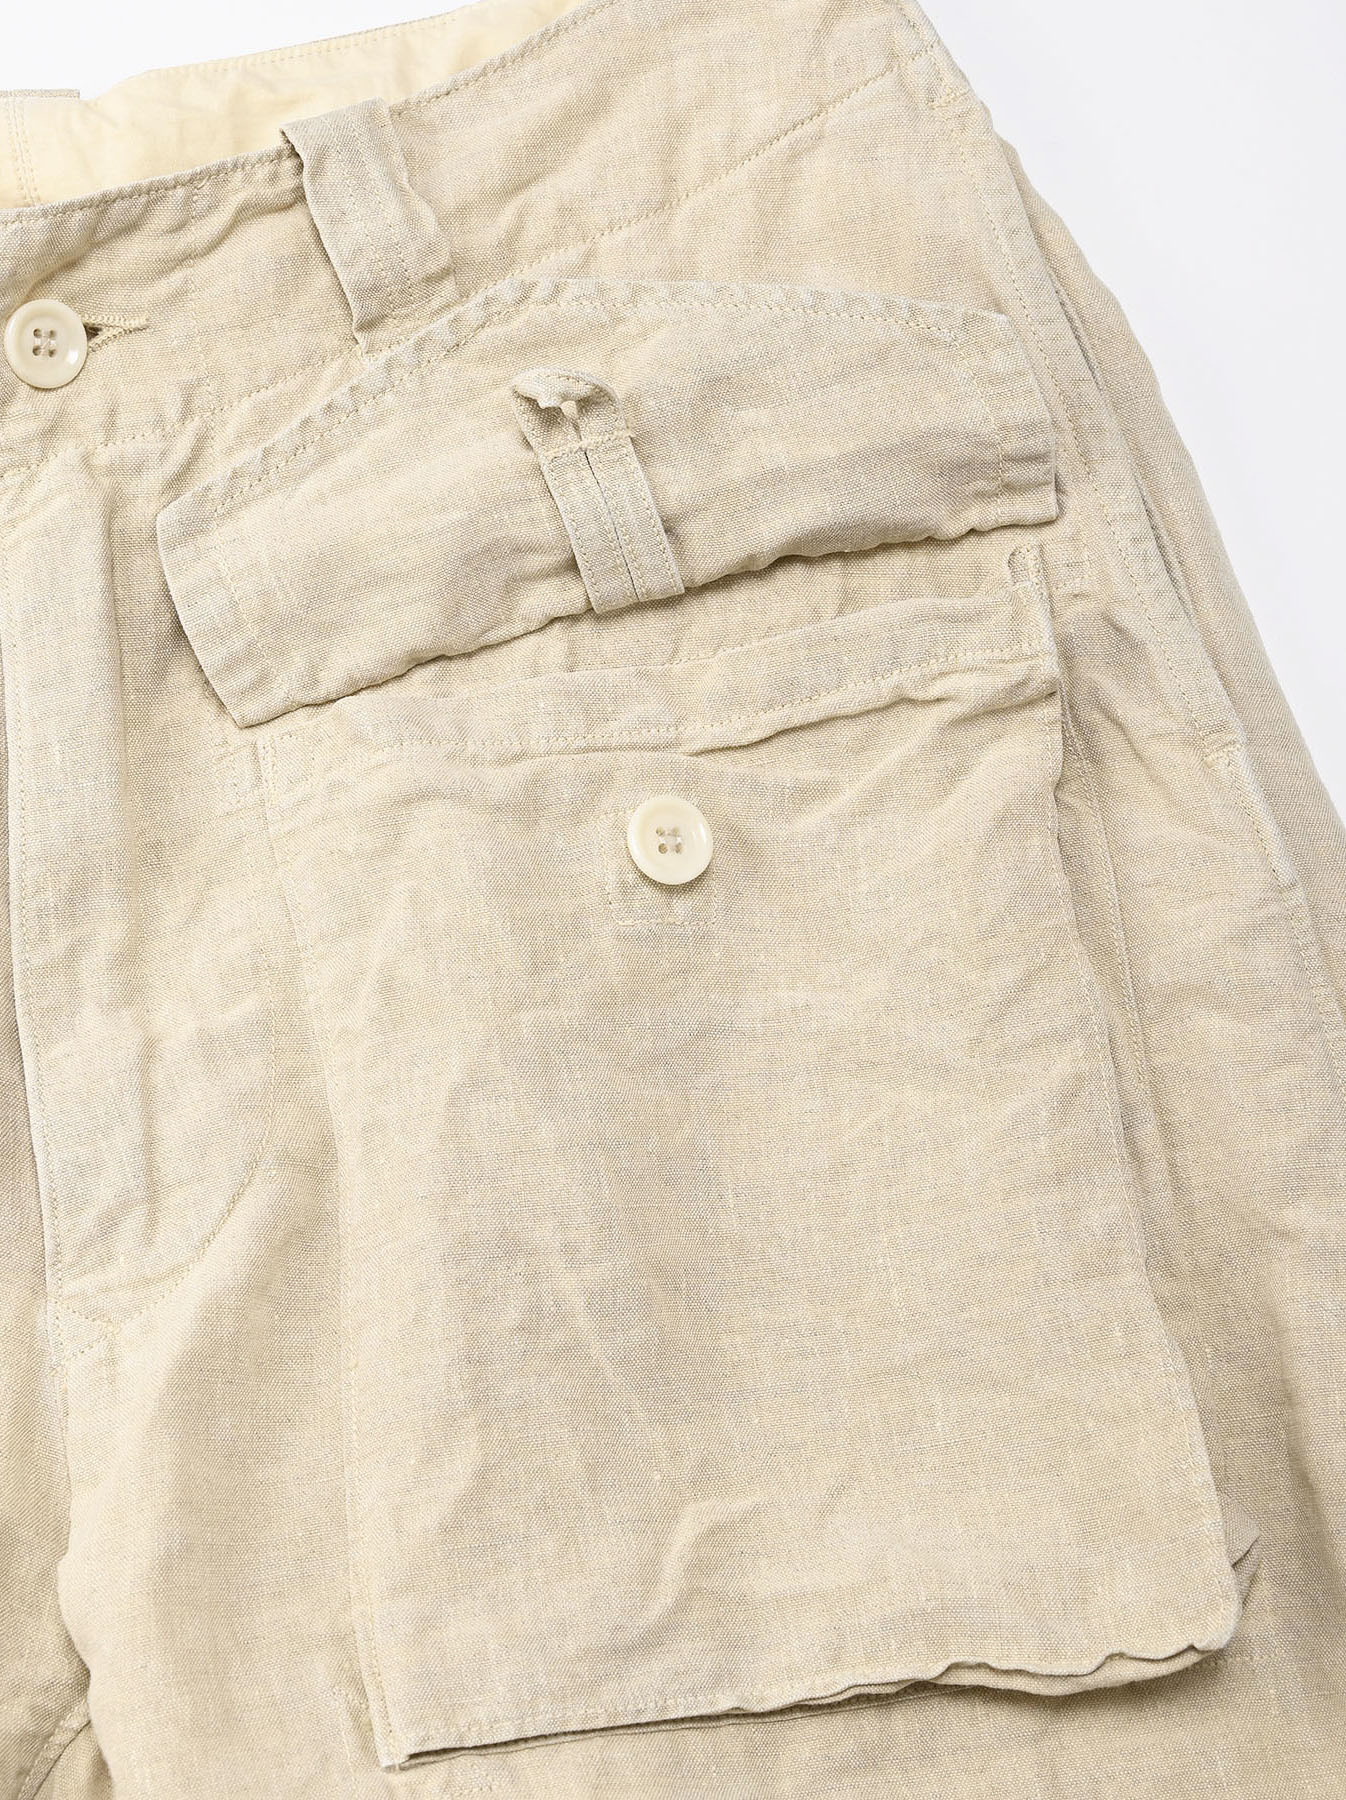 Linen 908 Easy Sail Shorts 0721)-11